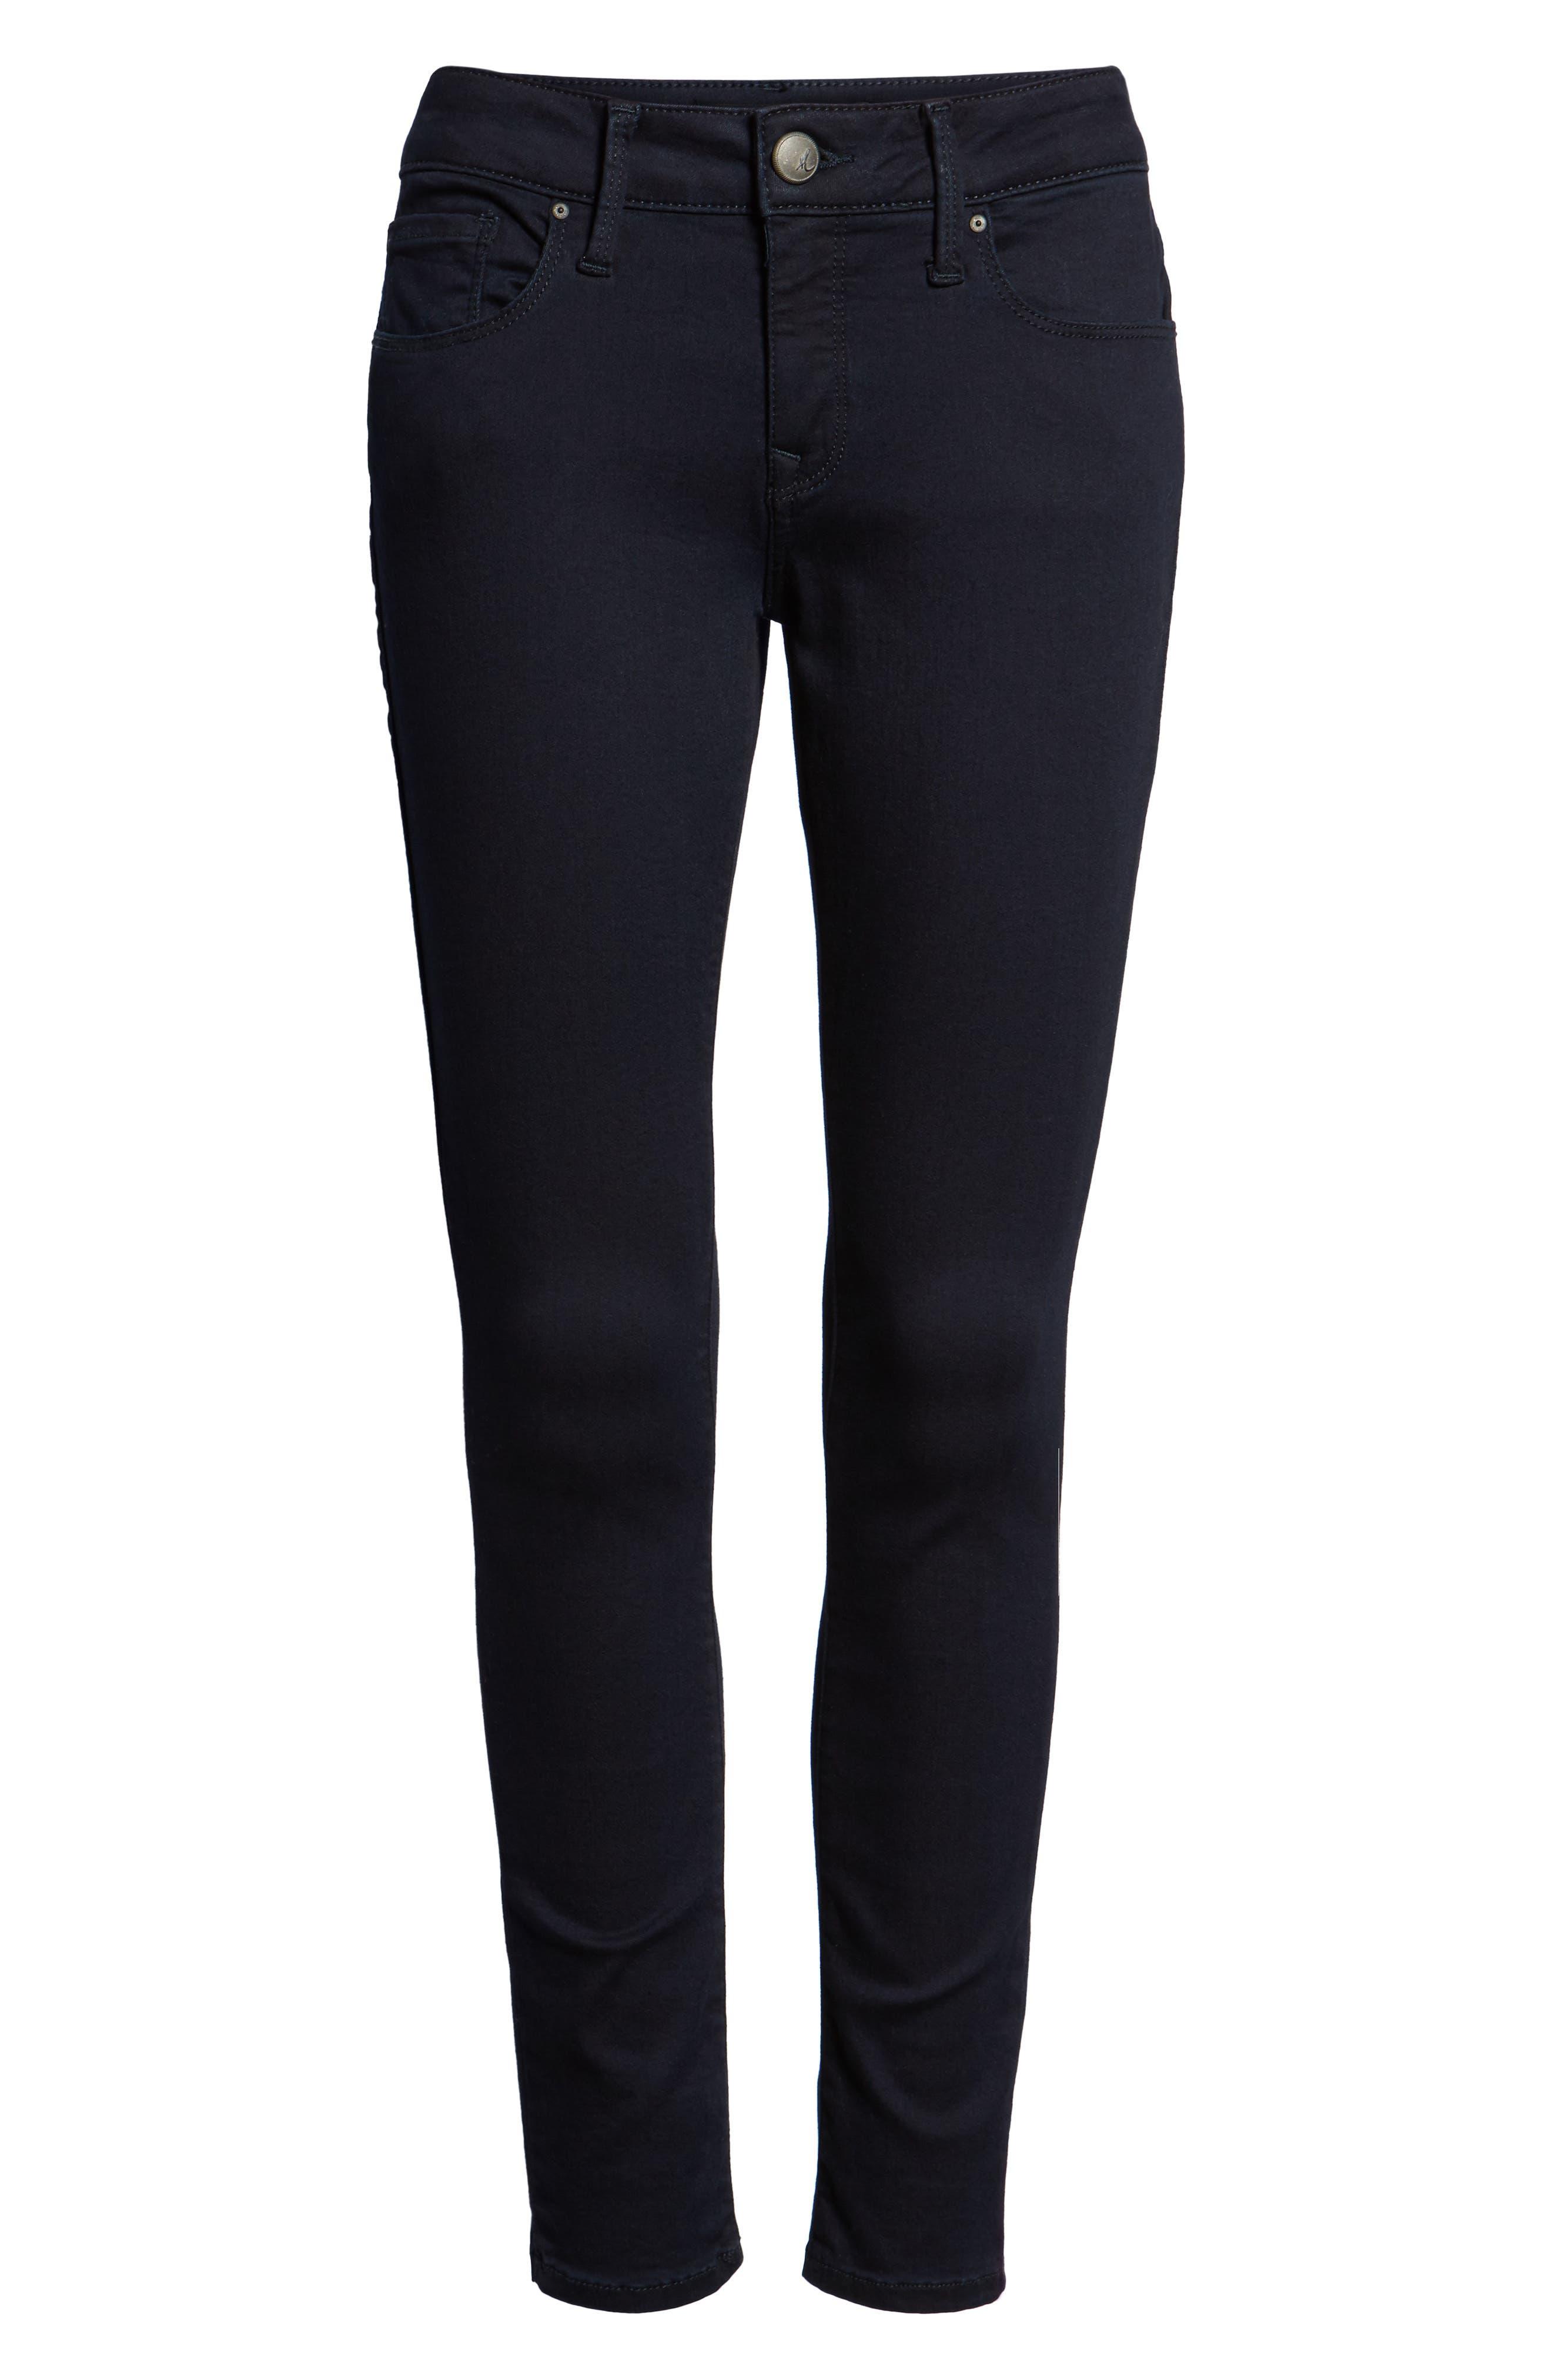 'Alexa' Midrise Skinny Jeans,                             Alternate thumbnail 7, color,                             401